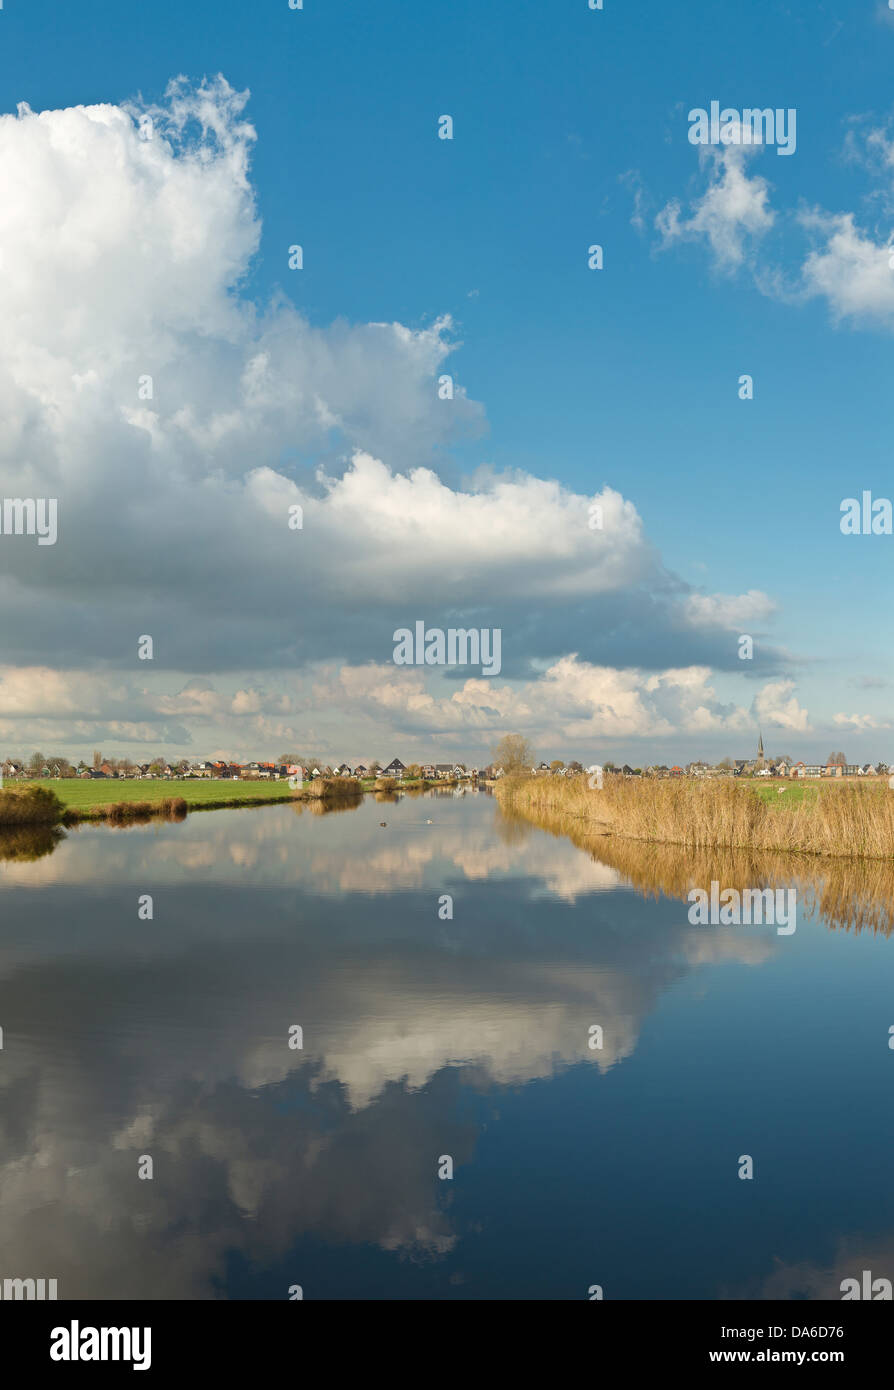 Holland, Paesi Bassi, Europa, Wormer, riflessioni, calma, acqua, paesaggio, acqua, inverno, nuvole, riflessioni, Immagini Stock